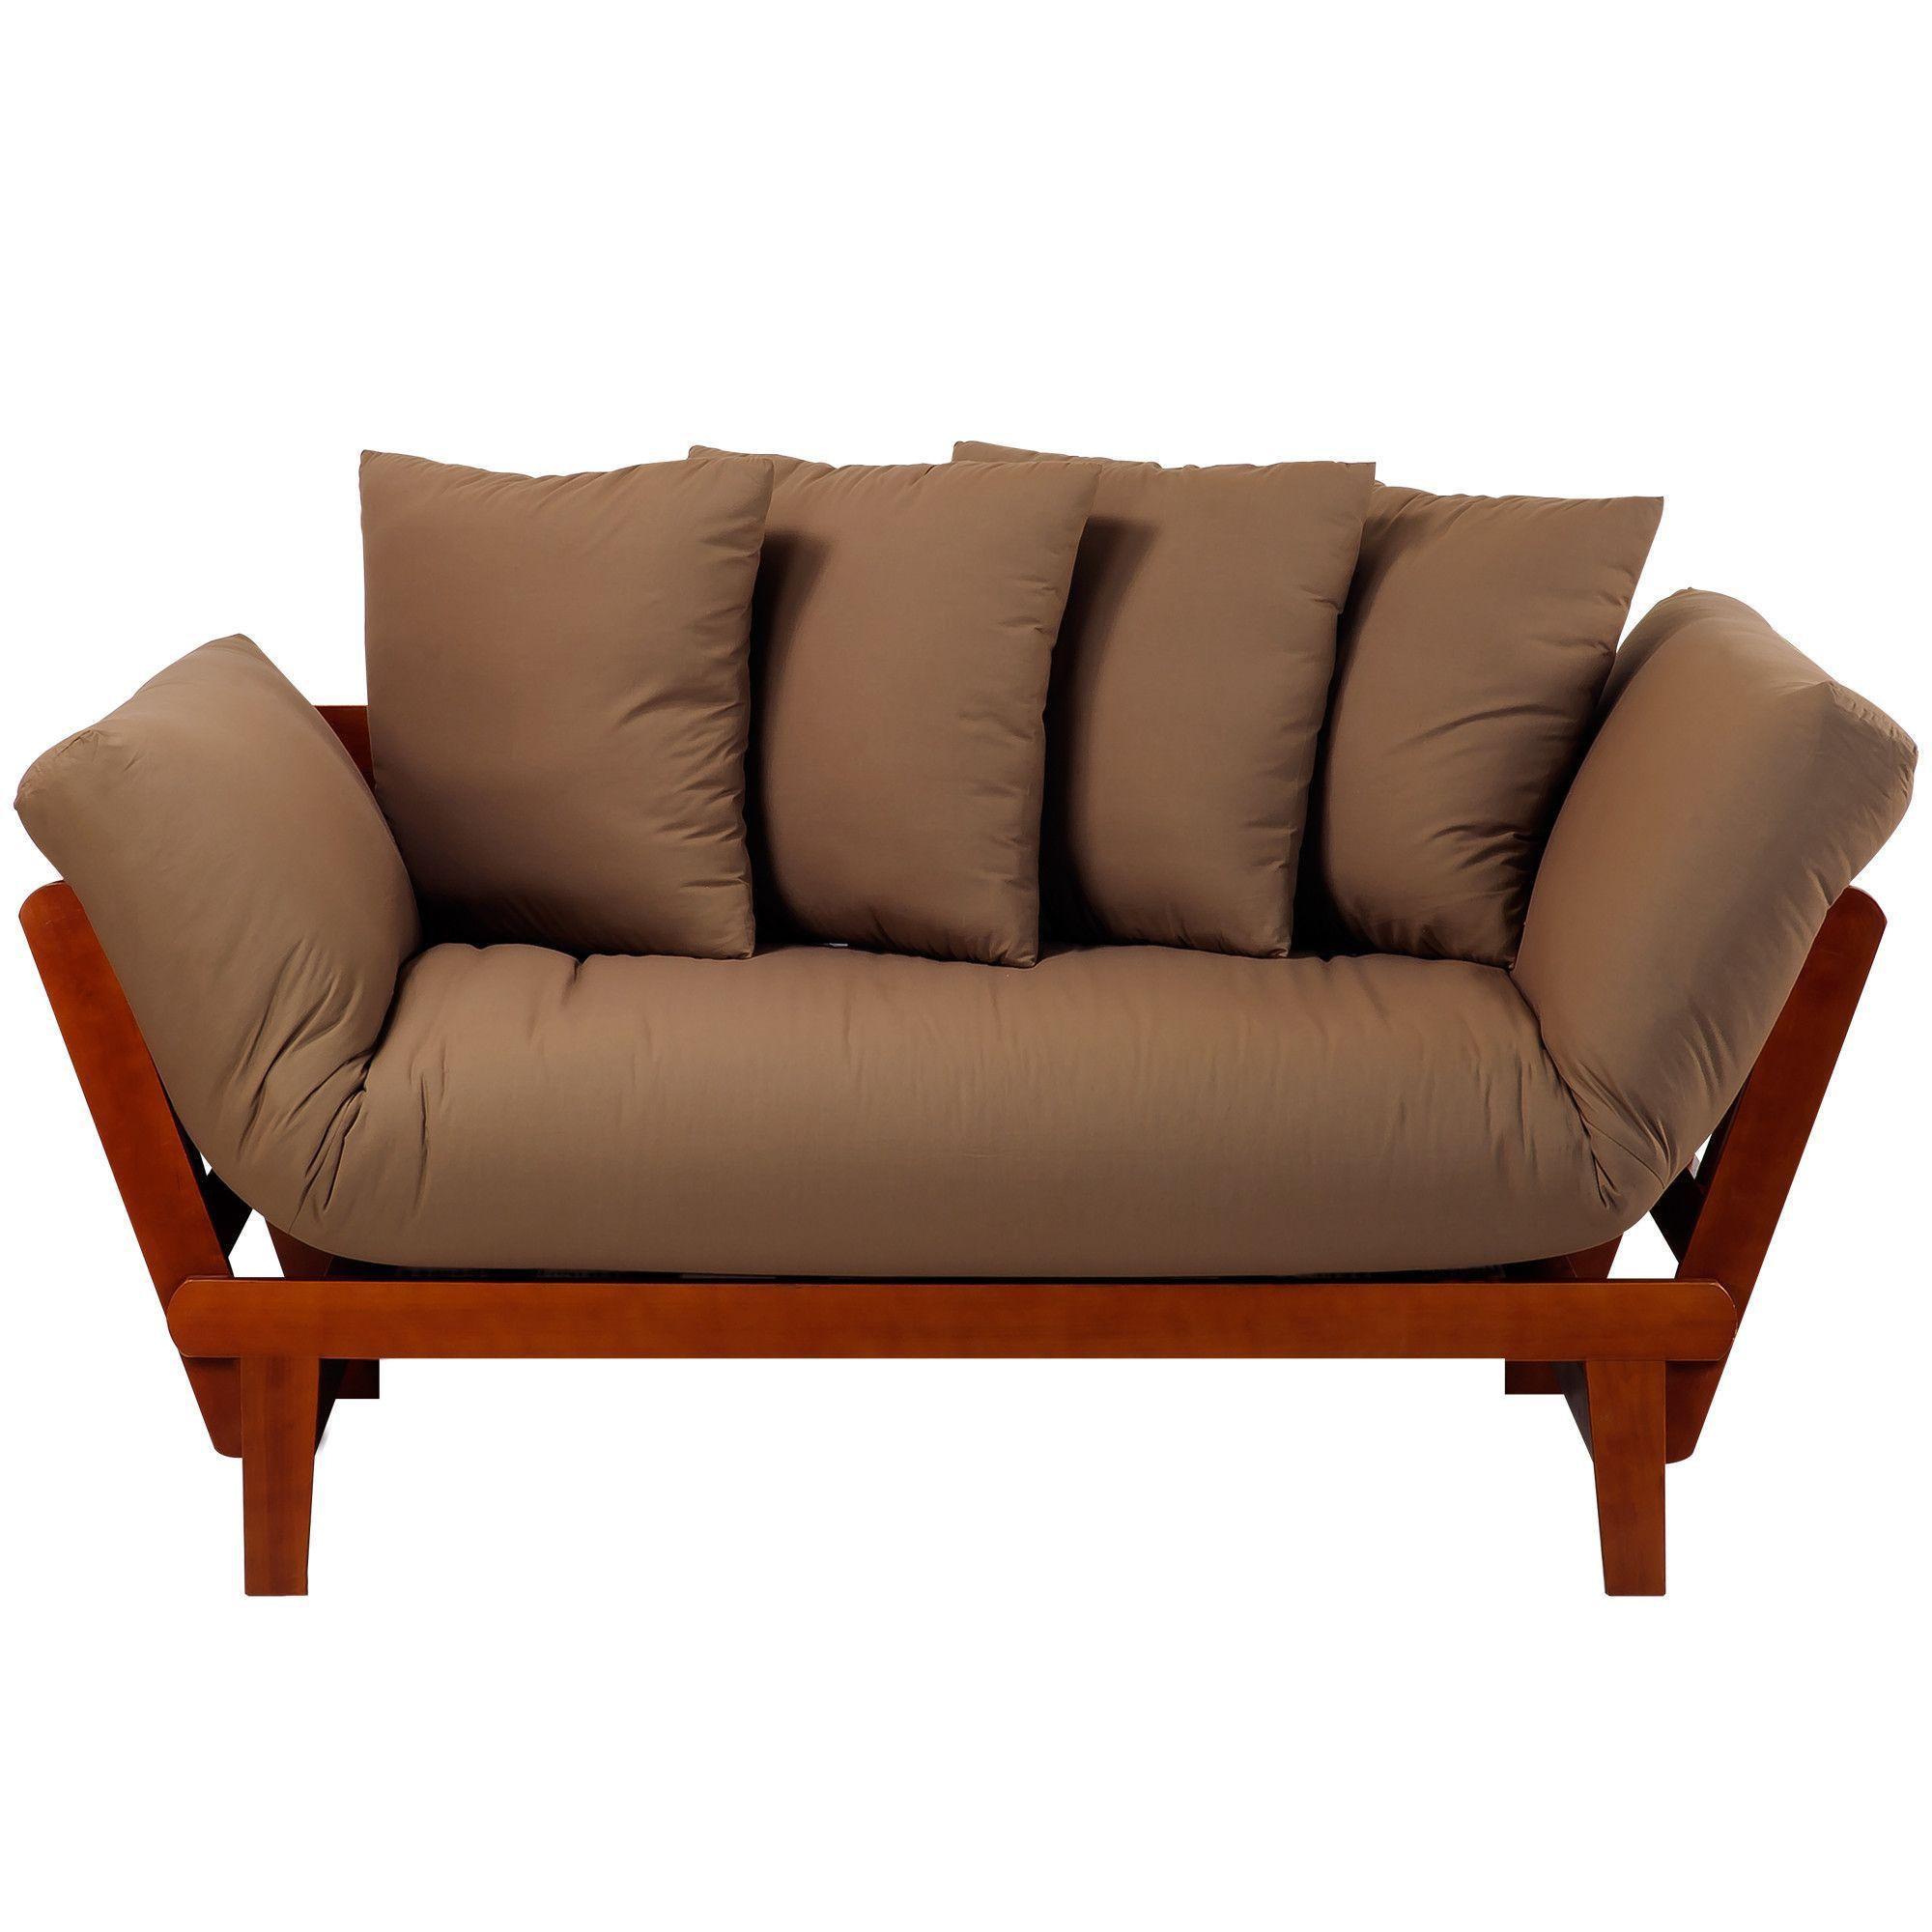 Shonna Twin Loose Back Futon and Mattress Sofa bed frame